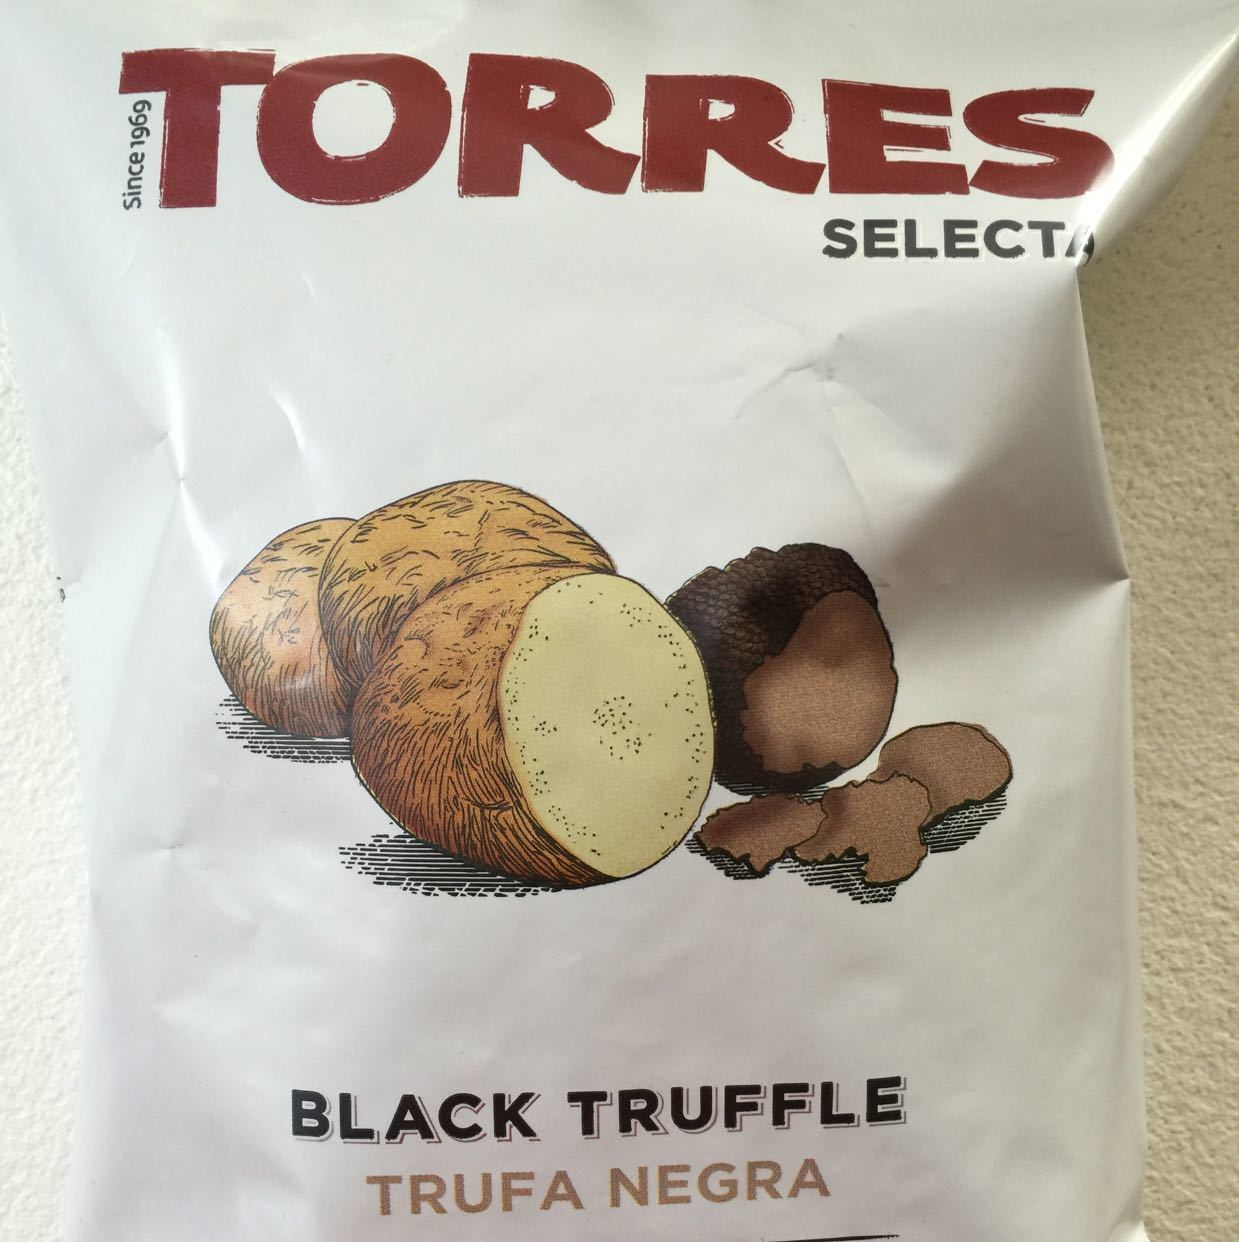 Black Truffle crisps